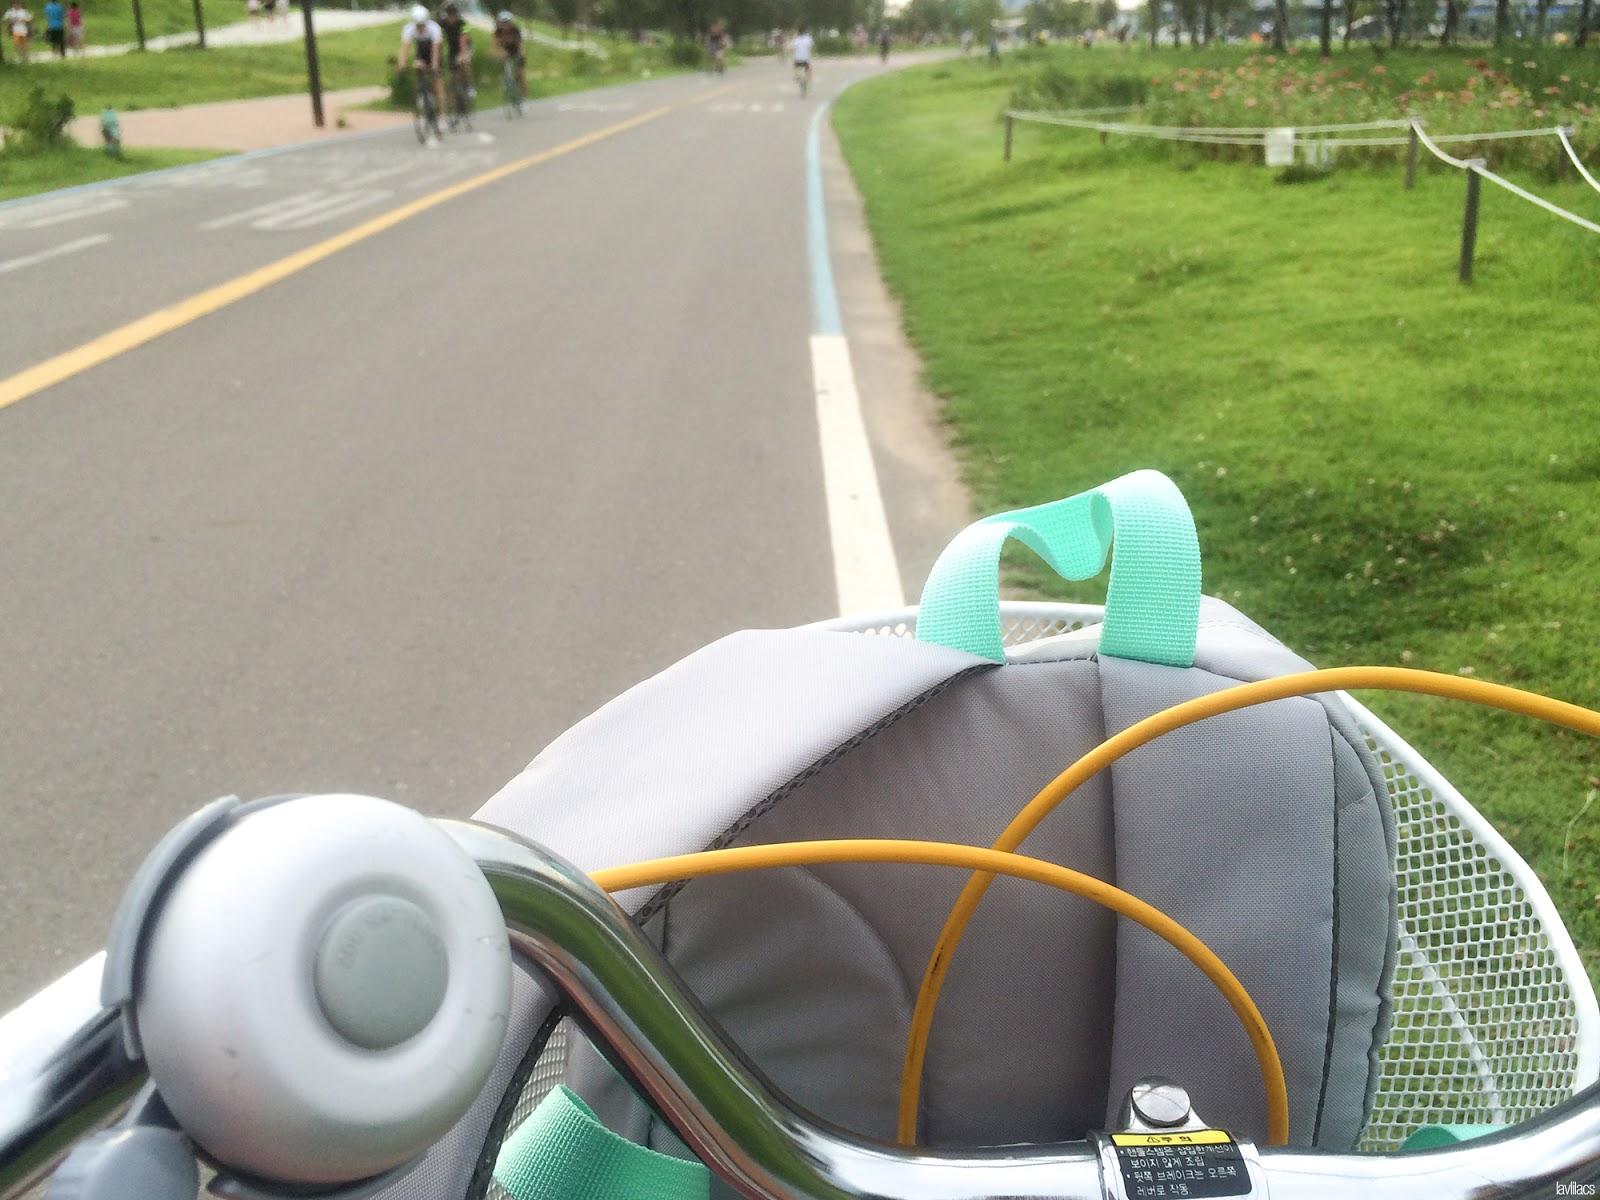 Seoul, Korea - Summer Study Abroad 2014 - Biking in Yeouido Park